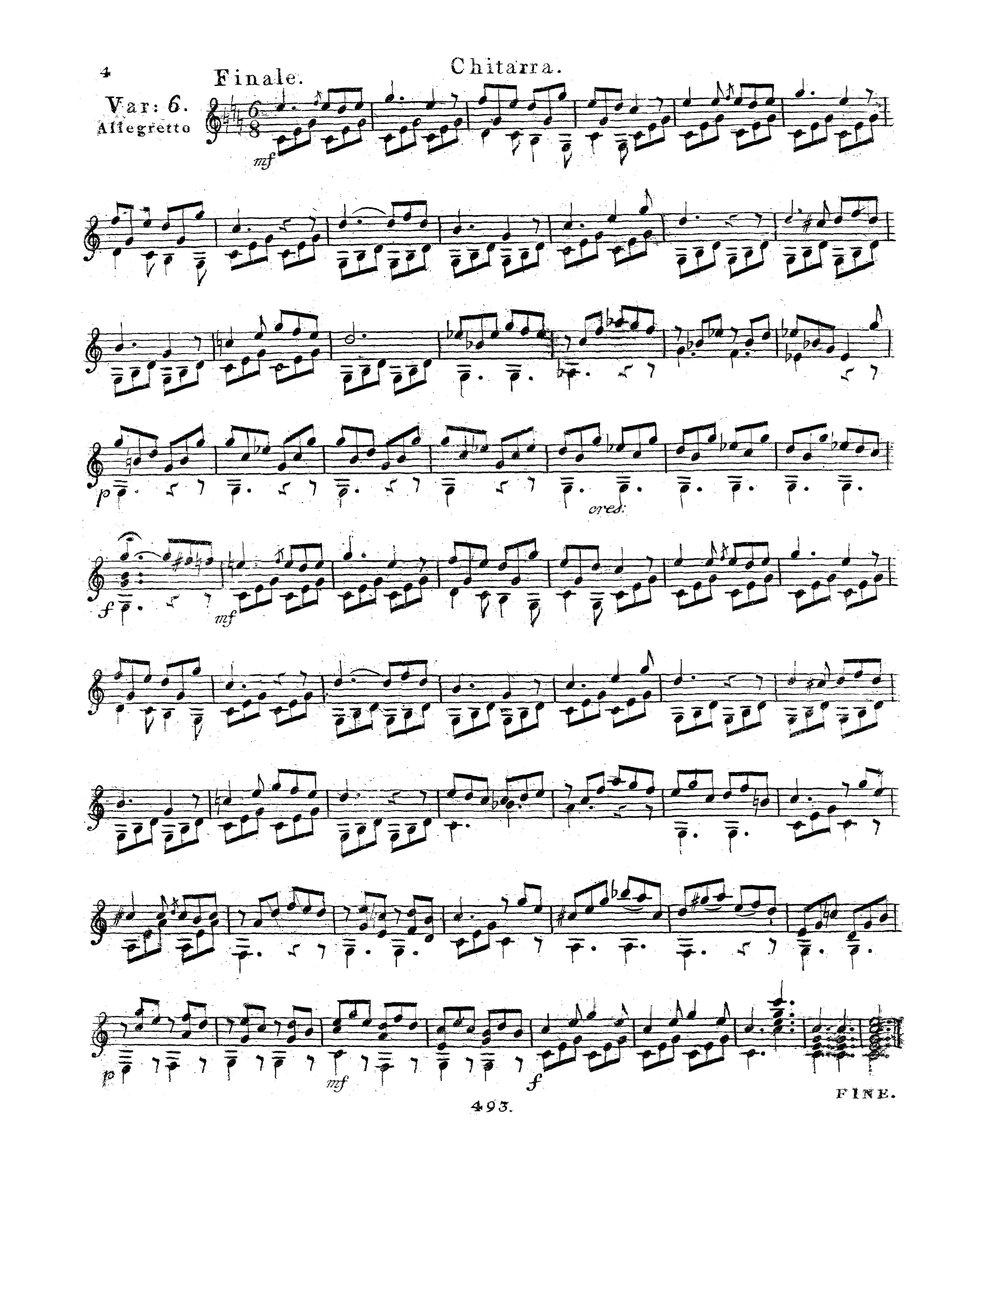 6 Variazioni brillanti su la Cavatina Di tanti palpiti, Op.87 (Giuliani, Mauro) 4.jpg